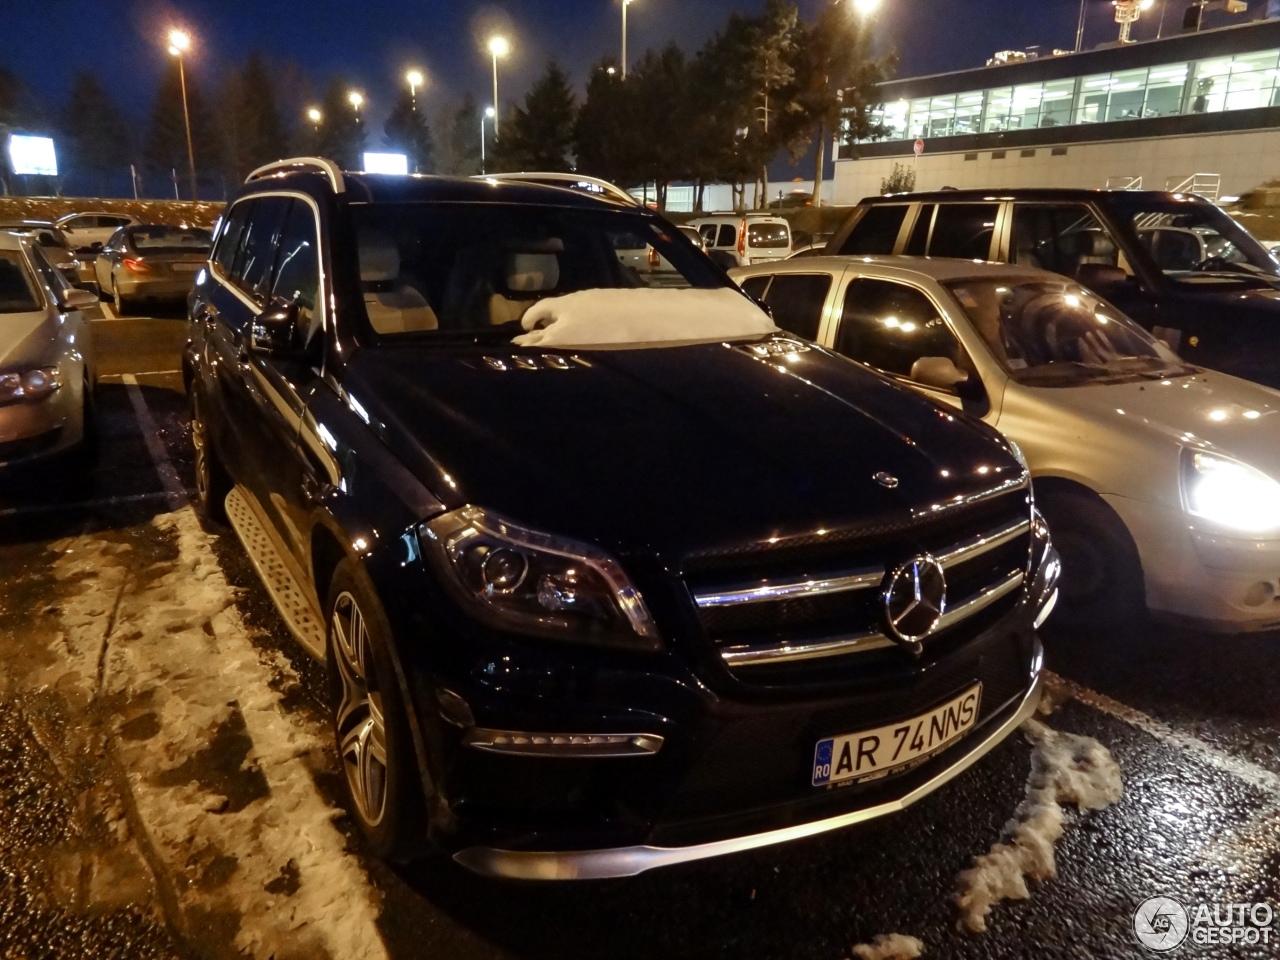 Mercedes benz gl 63 amg x166 5 january 2015 autogespot for Mercedes benz gl amg 2015